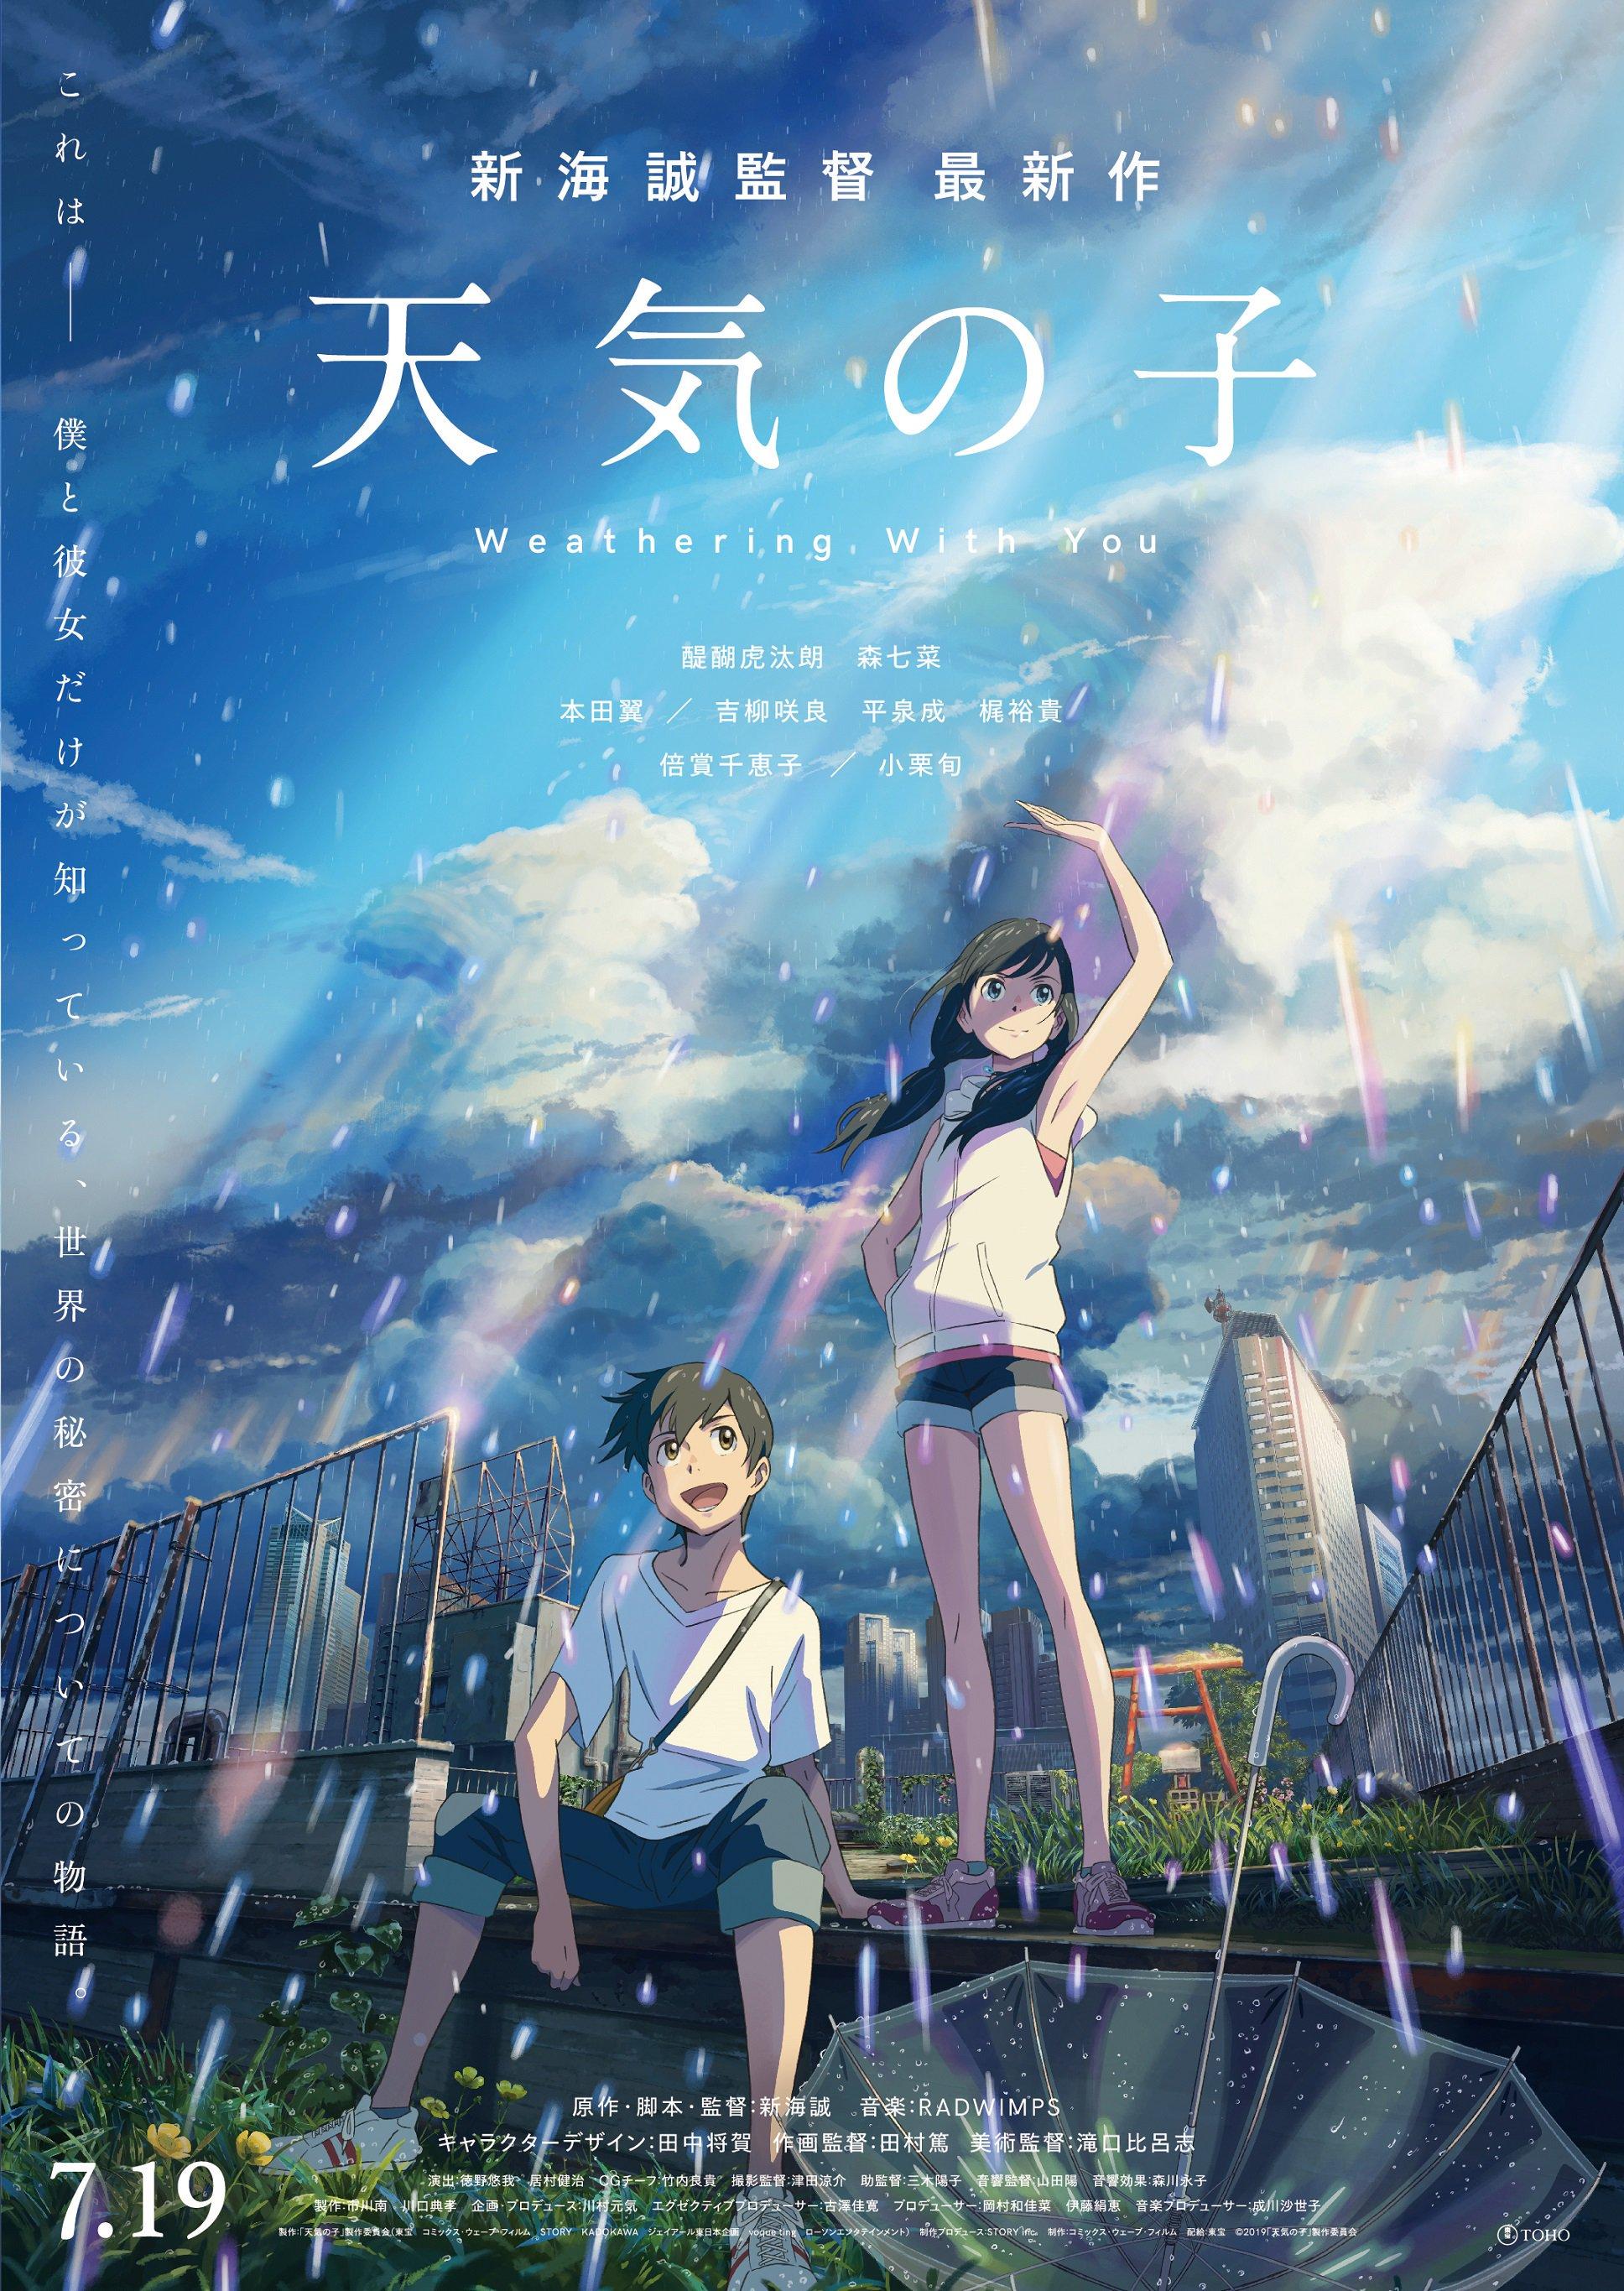 Top 10 Upcoming Anime Of 2020.Weathering With You 2019 Imdb